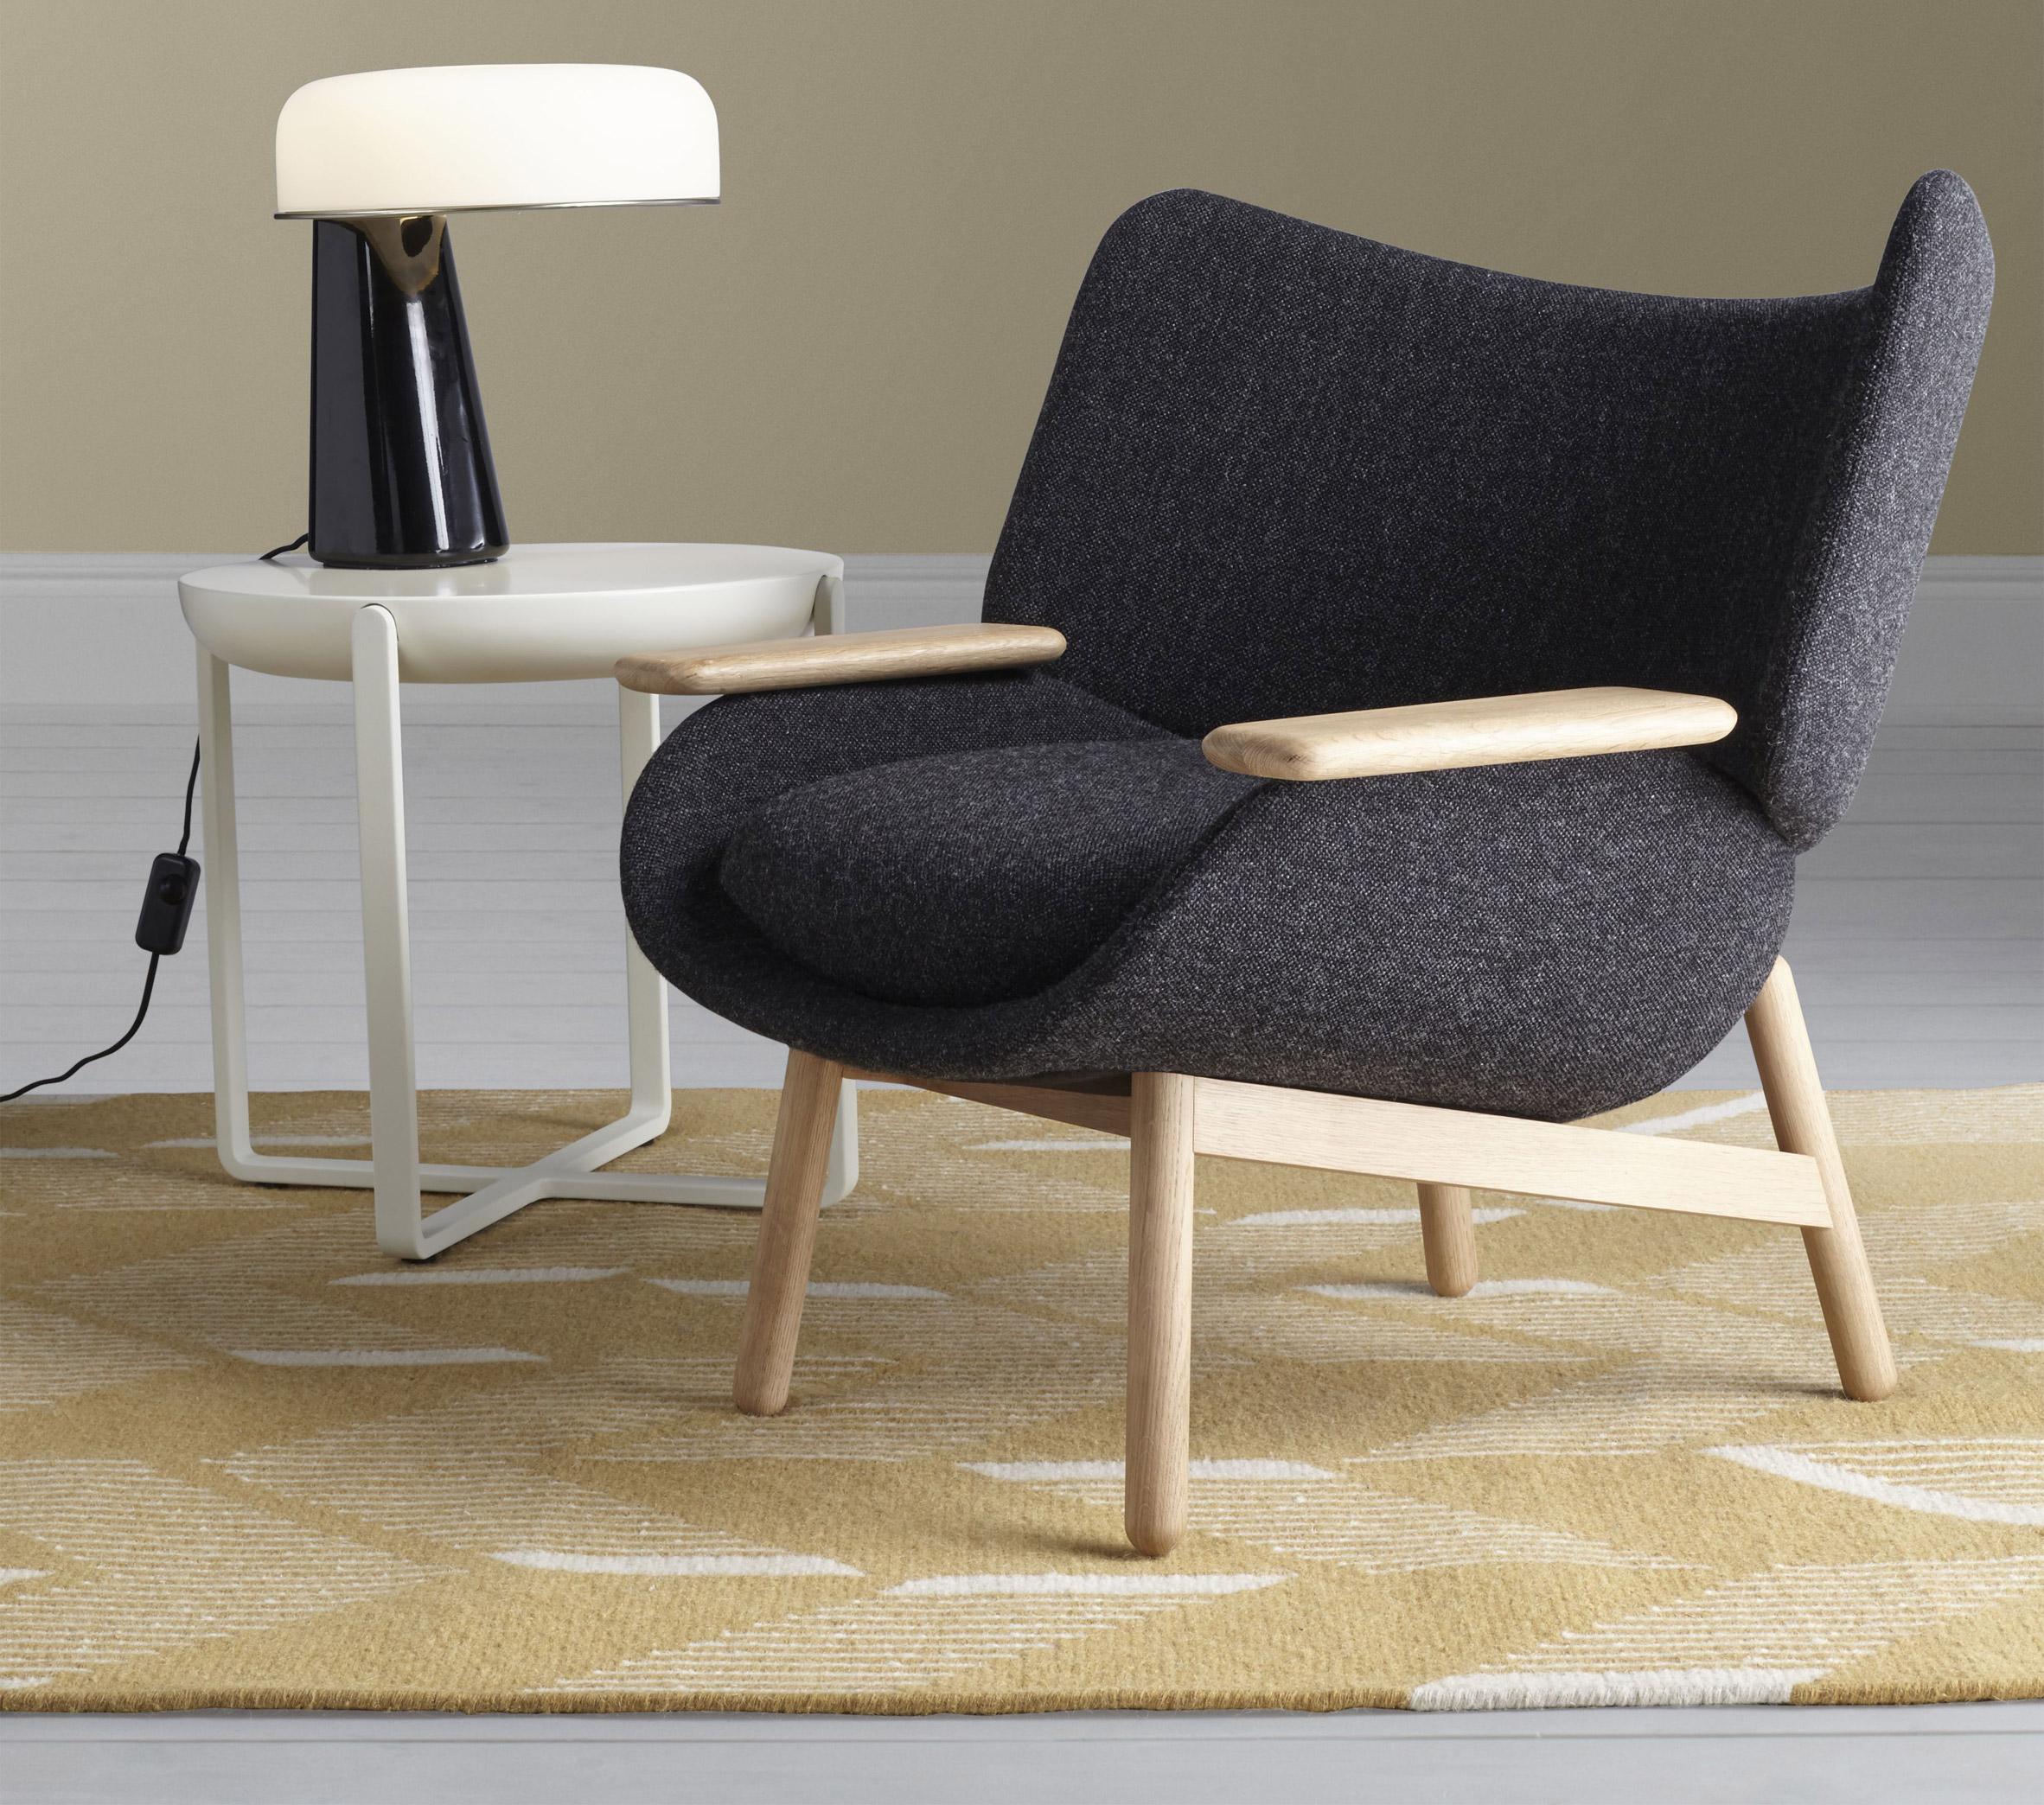 doshi-levien-furniture-collection-john-lewis-design_dezeen_2364_col_7